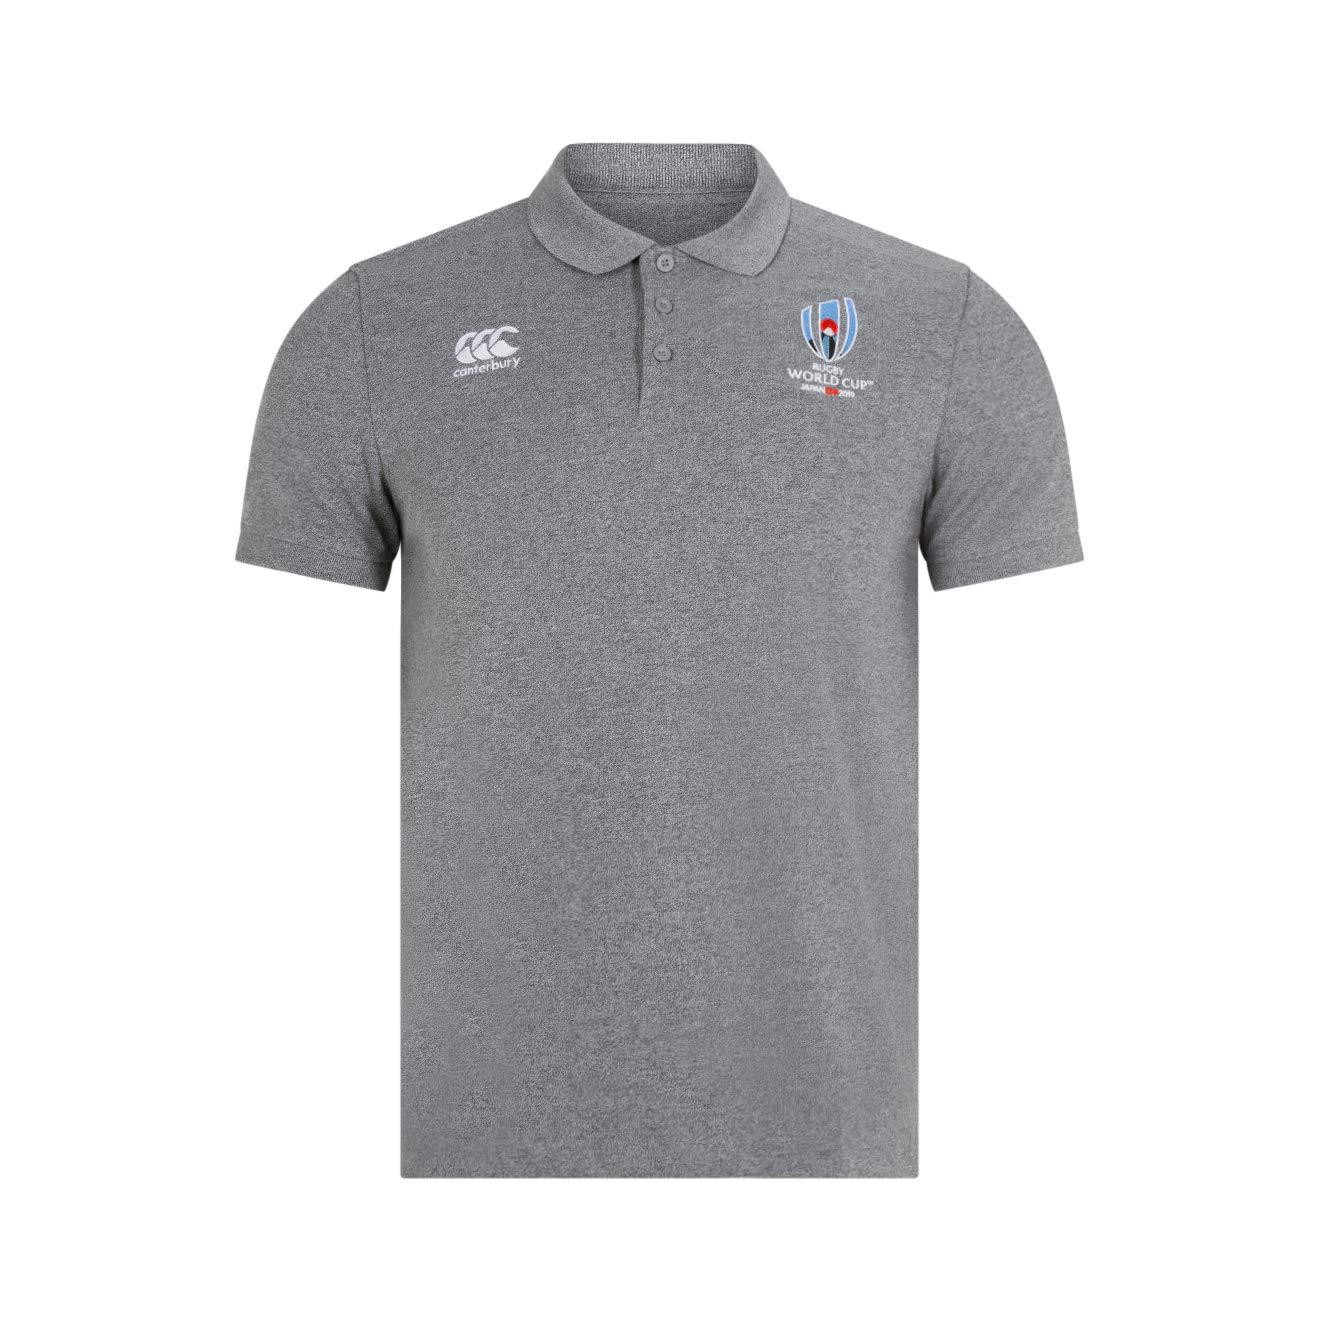 Canterbury Official Rugby World Cup 19 Mens Cotton Pique Polo